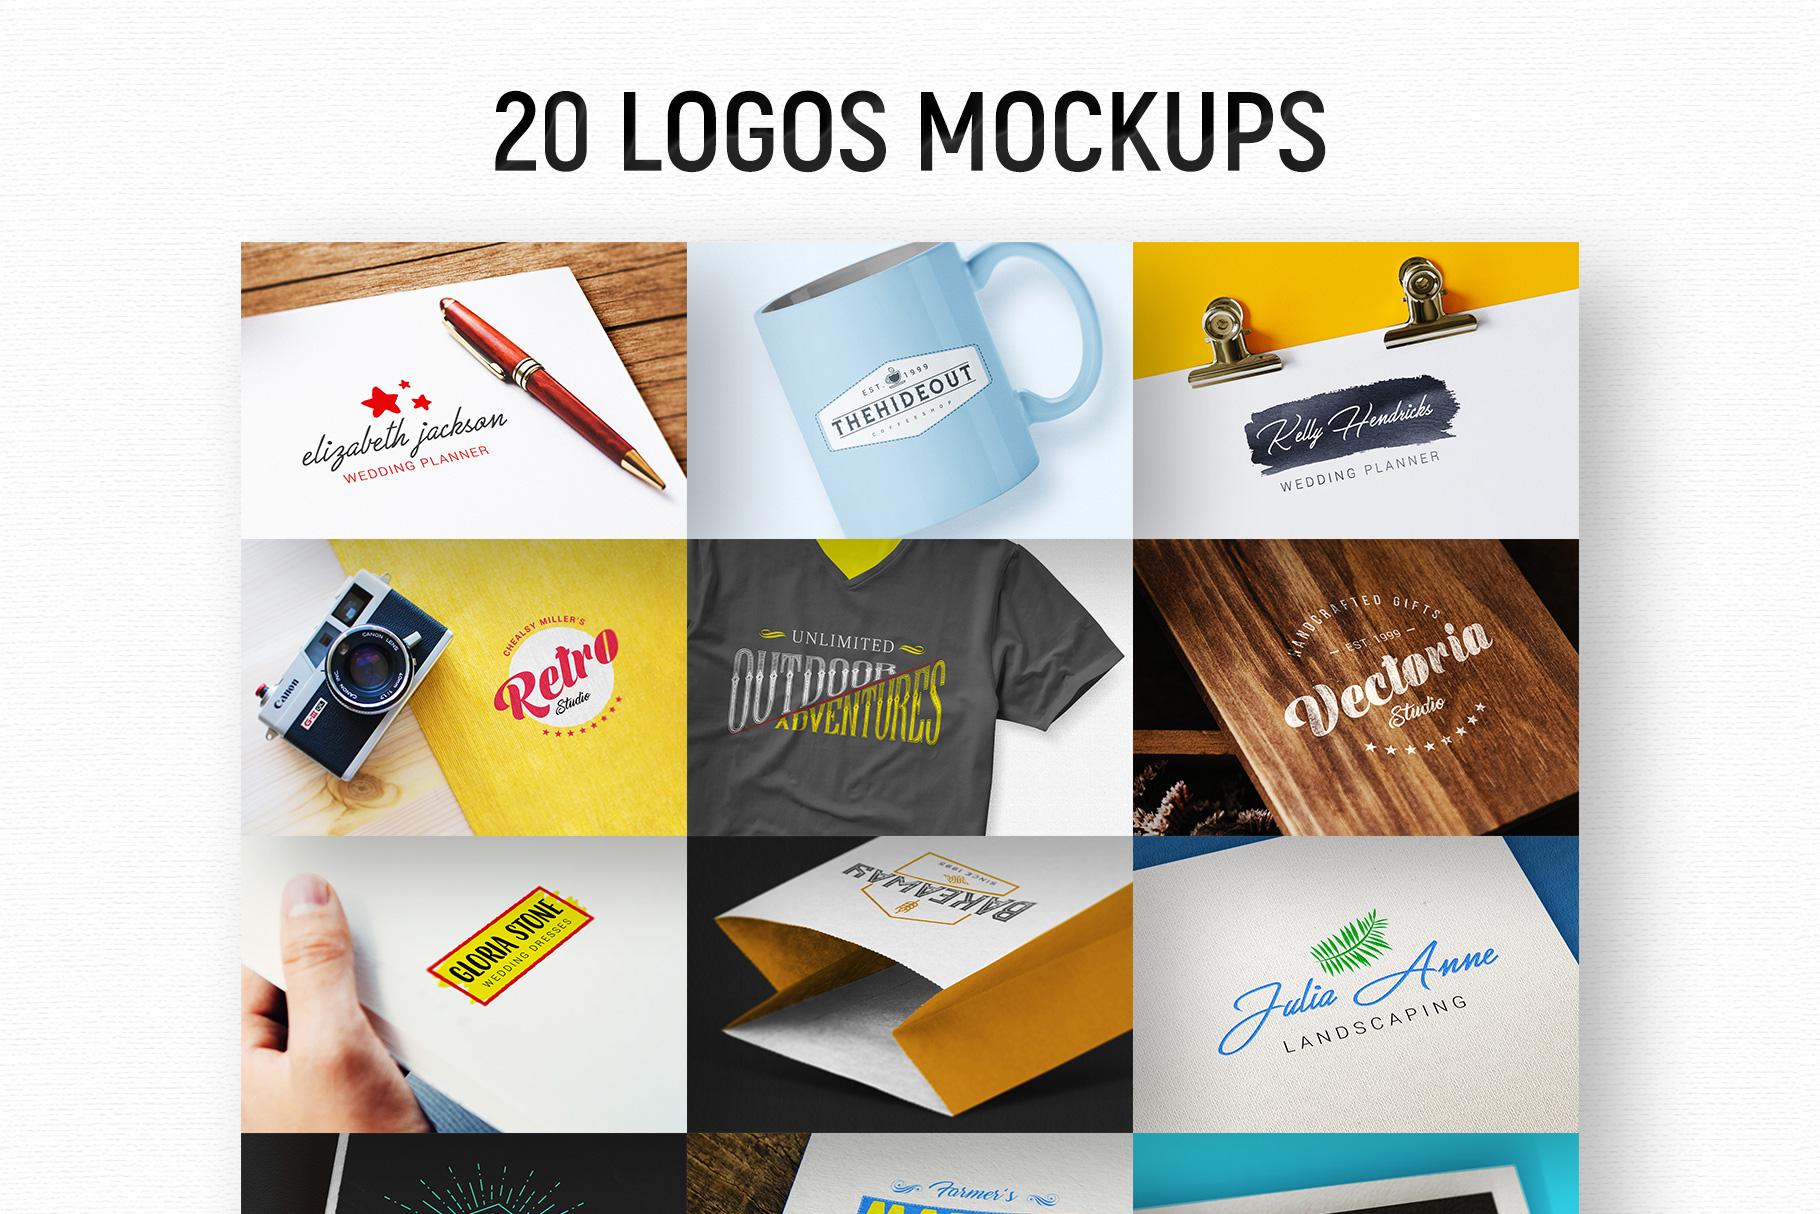 20 Logos Mockups example image 1